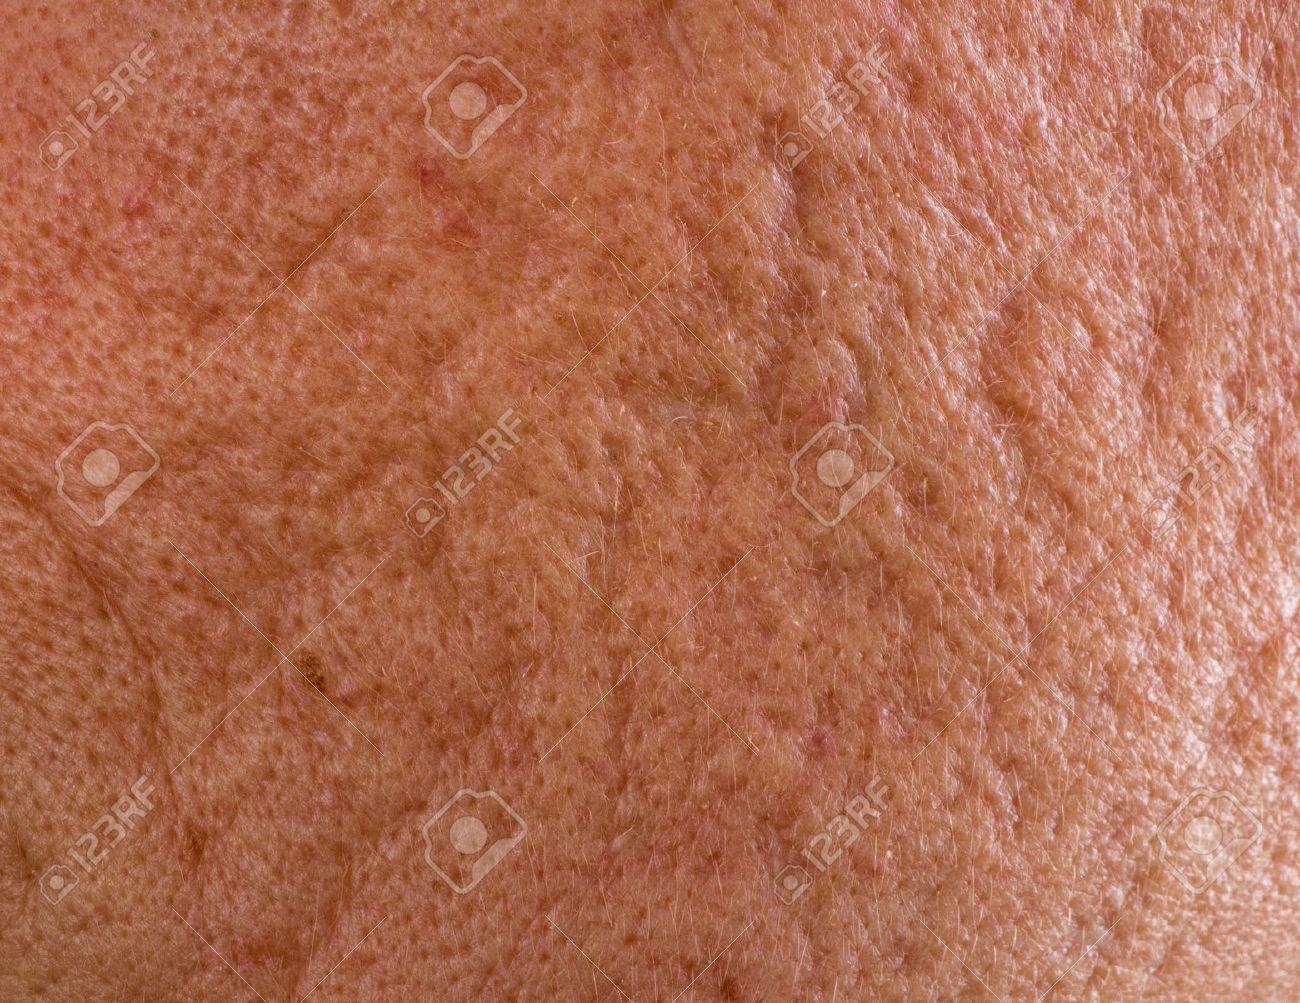 http://n3.datasn.io/data/api/v1/n3zm/image_of_skin_disease_5/main/skin_disease_image_download//fc/8a/82/1f/fc8a821f00ebdc7264a8f4667d7c9ad021748aa8.jpg